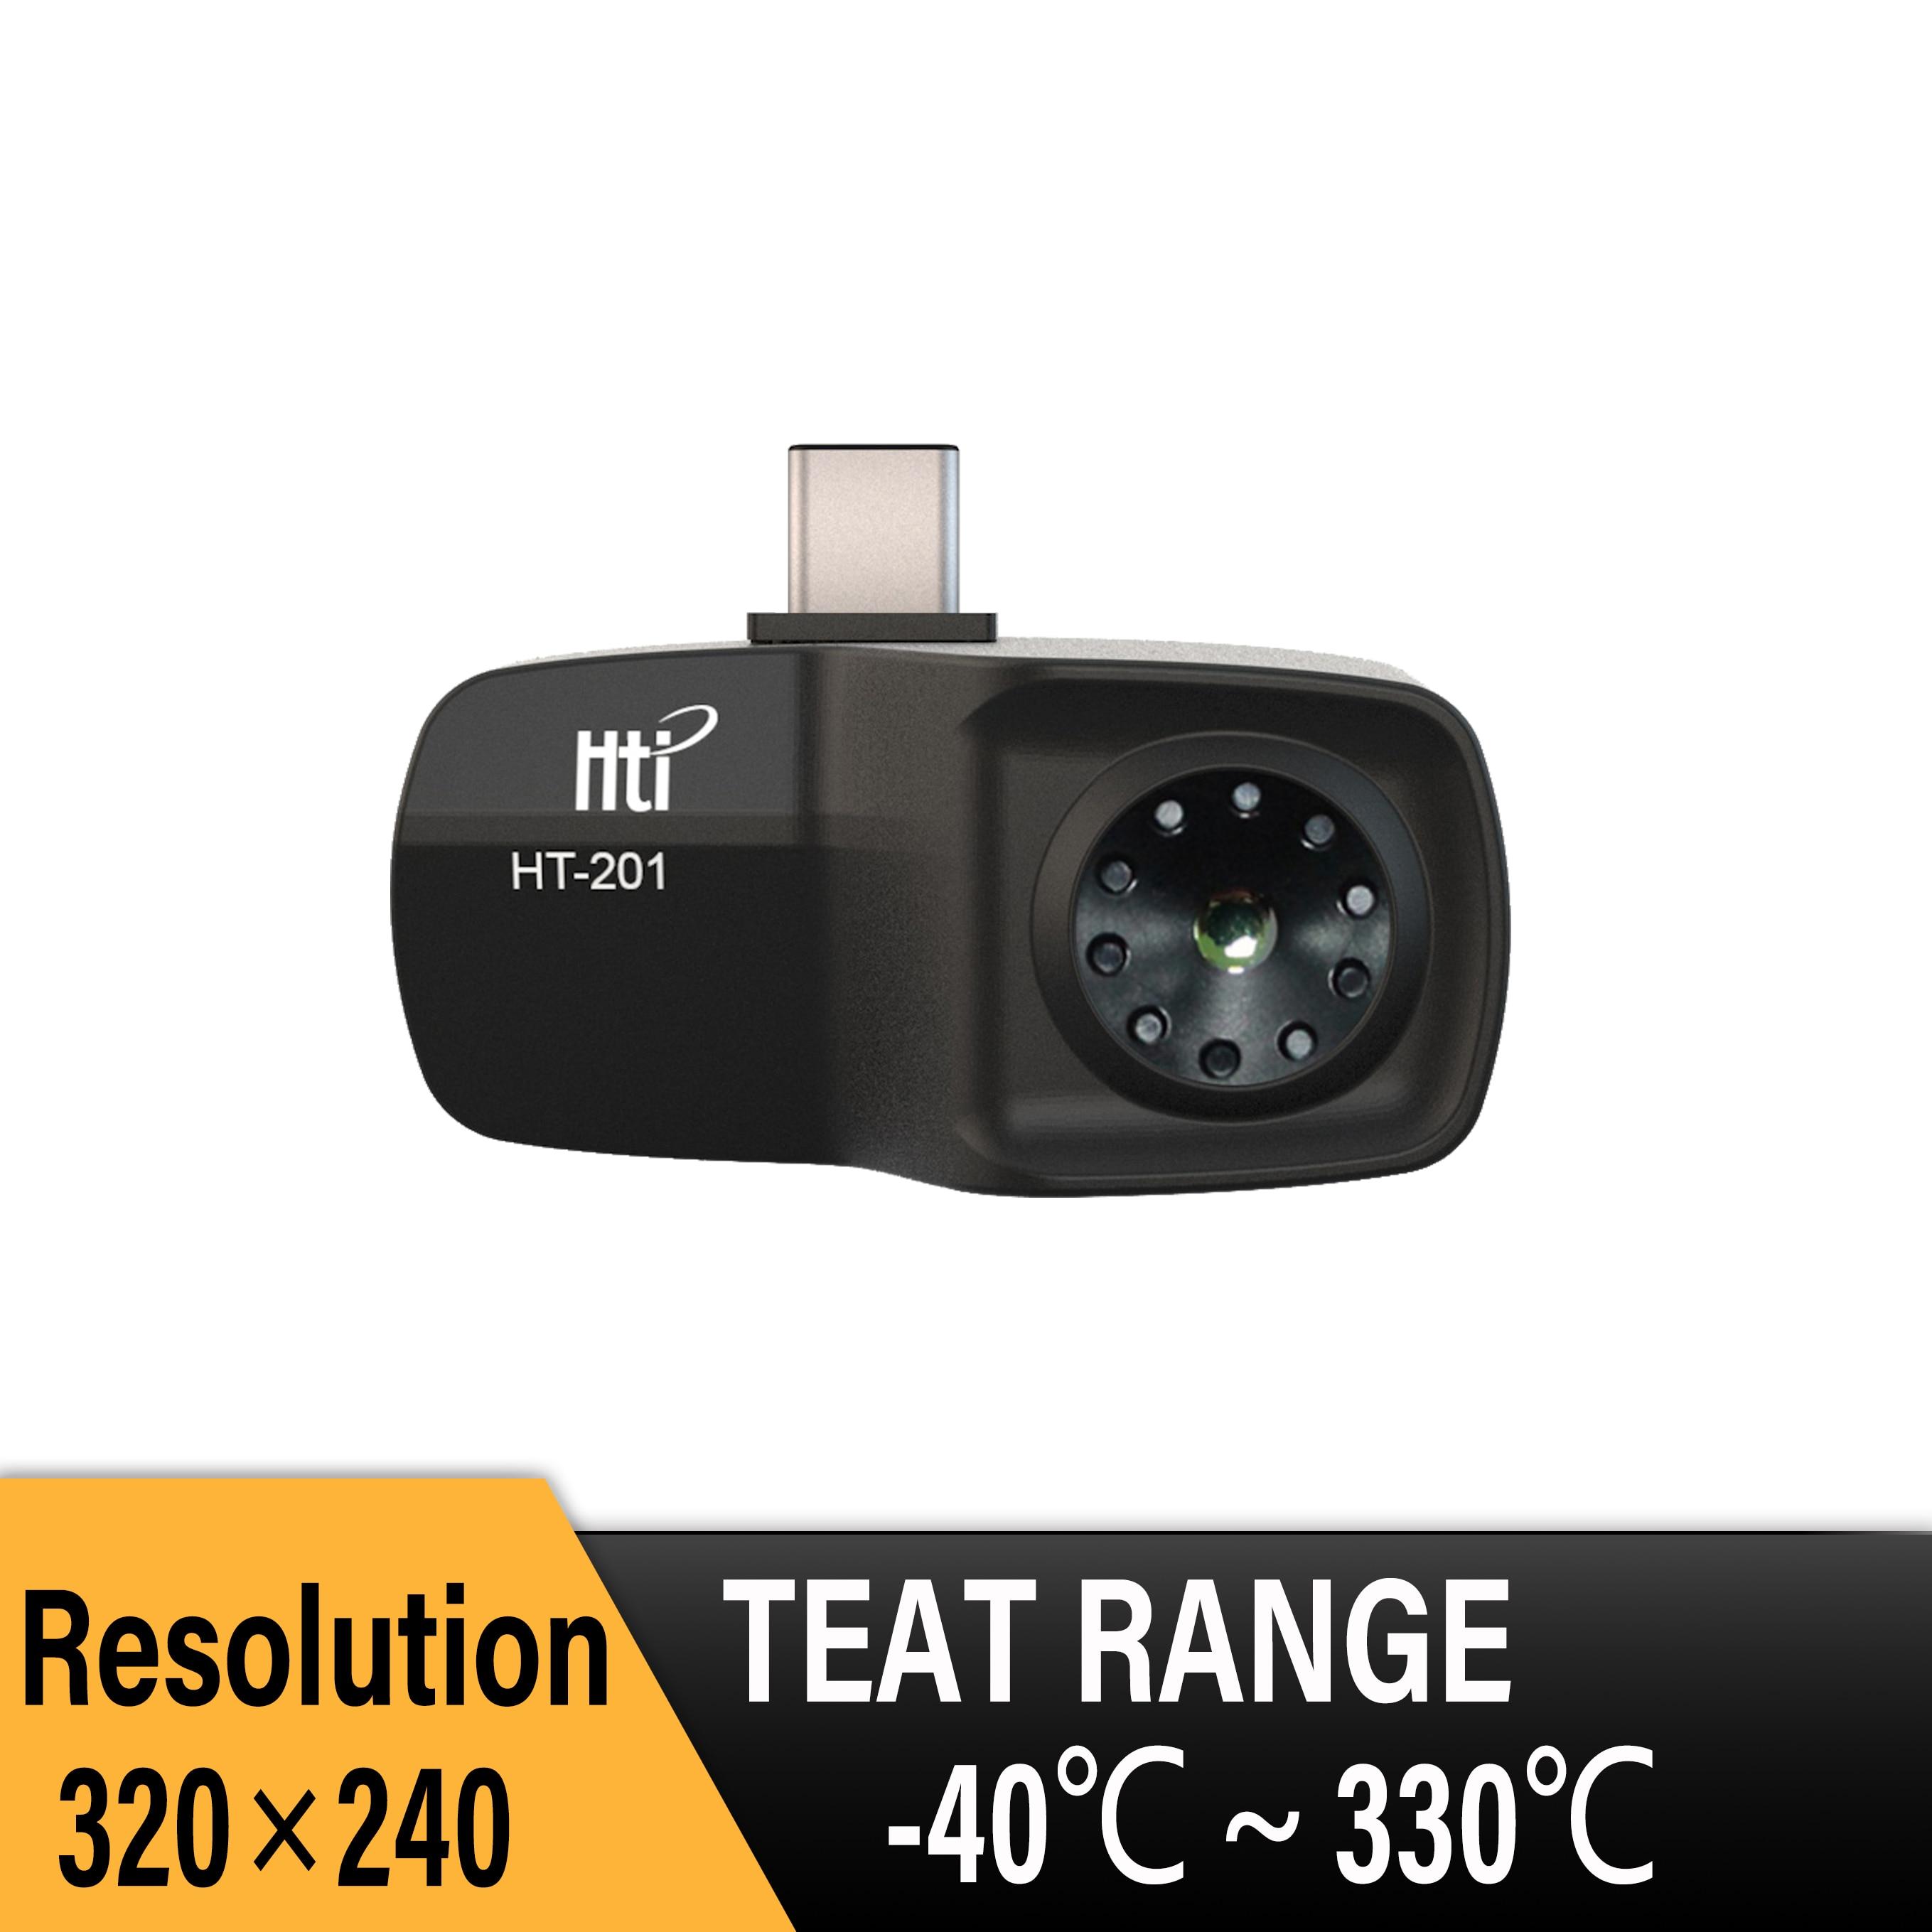 HT-201 هاتف محمول صغير كاميرا تصوير حراري كاميرا تصوير بالأشعة تحت الحمراء كاميرا حرارية دقة 320x240 متينة